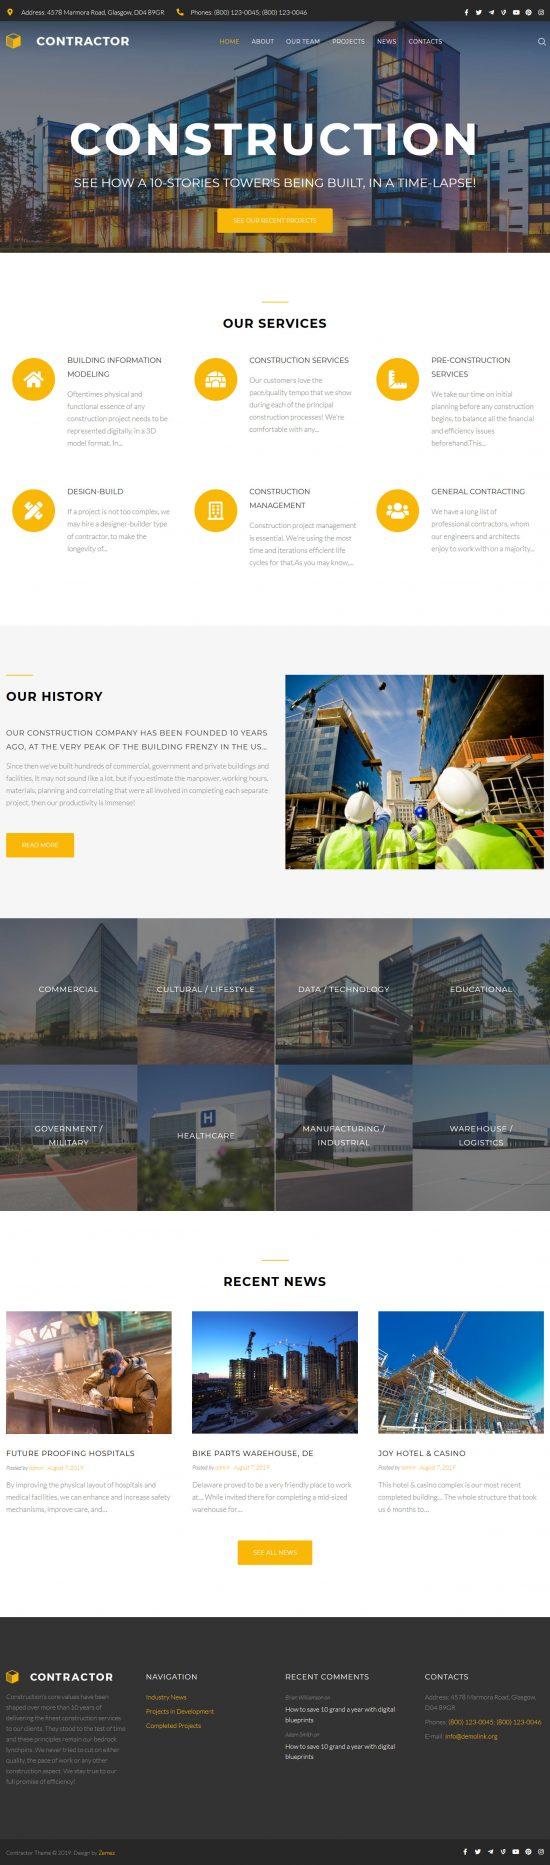 contractor elementor wordpress theme 01 550x1865 - Contractor Elementor WordPress Theme